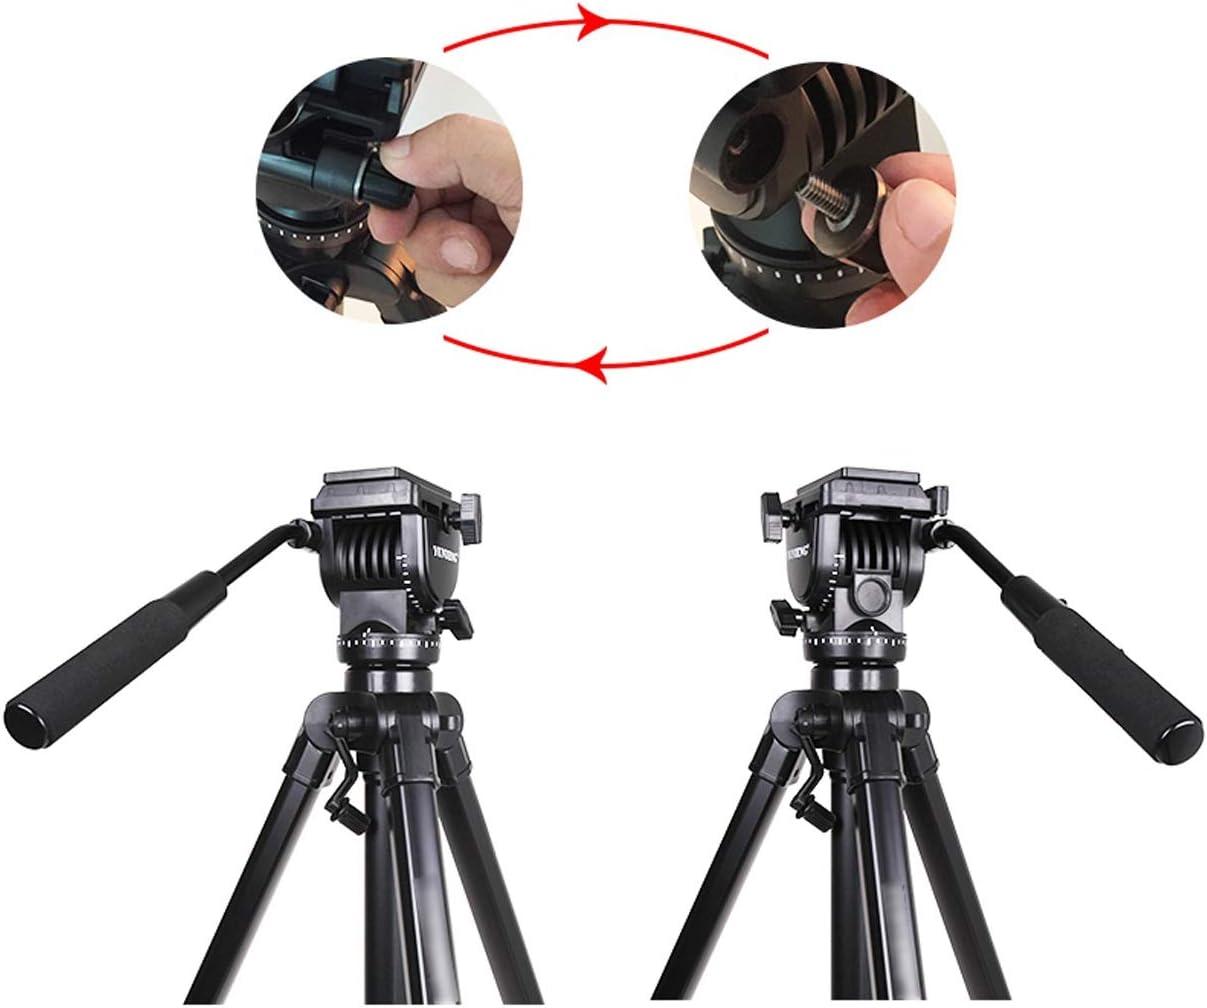 Size : C and Pulley CJGXJZJ Camera Tripod Aluminum Light Travel Digital SLR Camera Expandable Tripod Mobile Phone Self-Timer Tripod with Storage Bag Black Multi-Style Optional